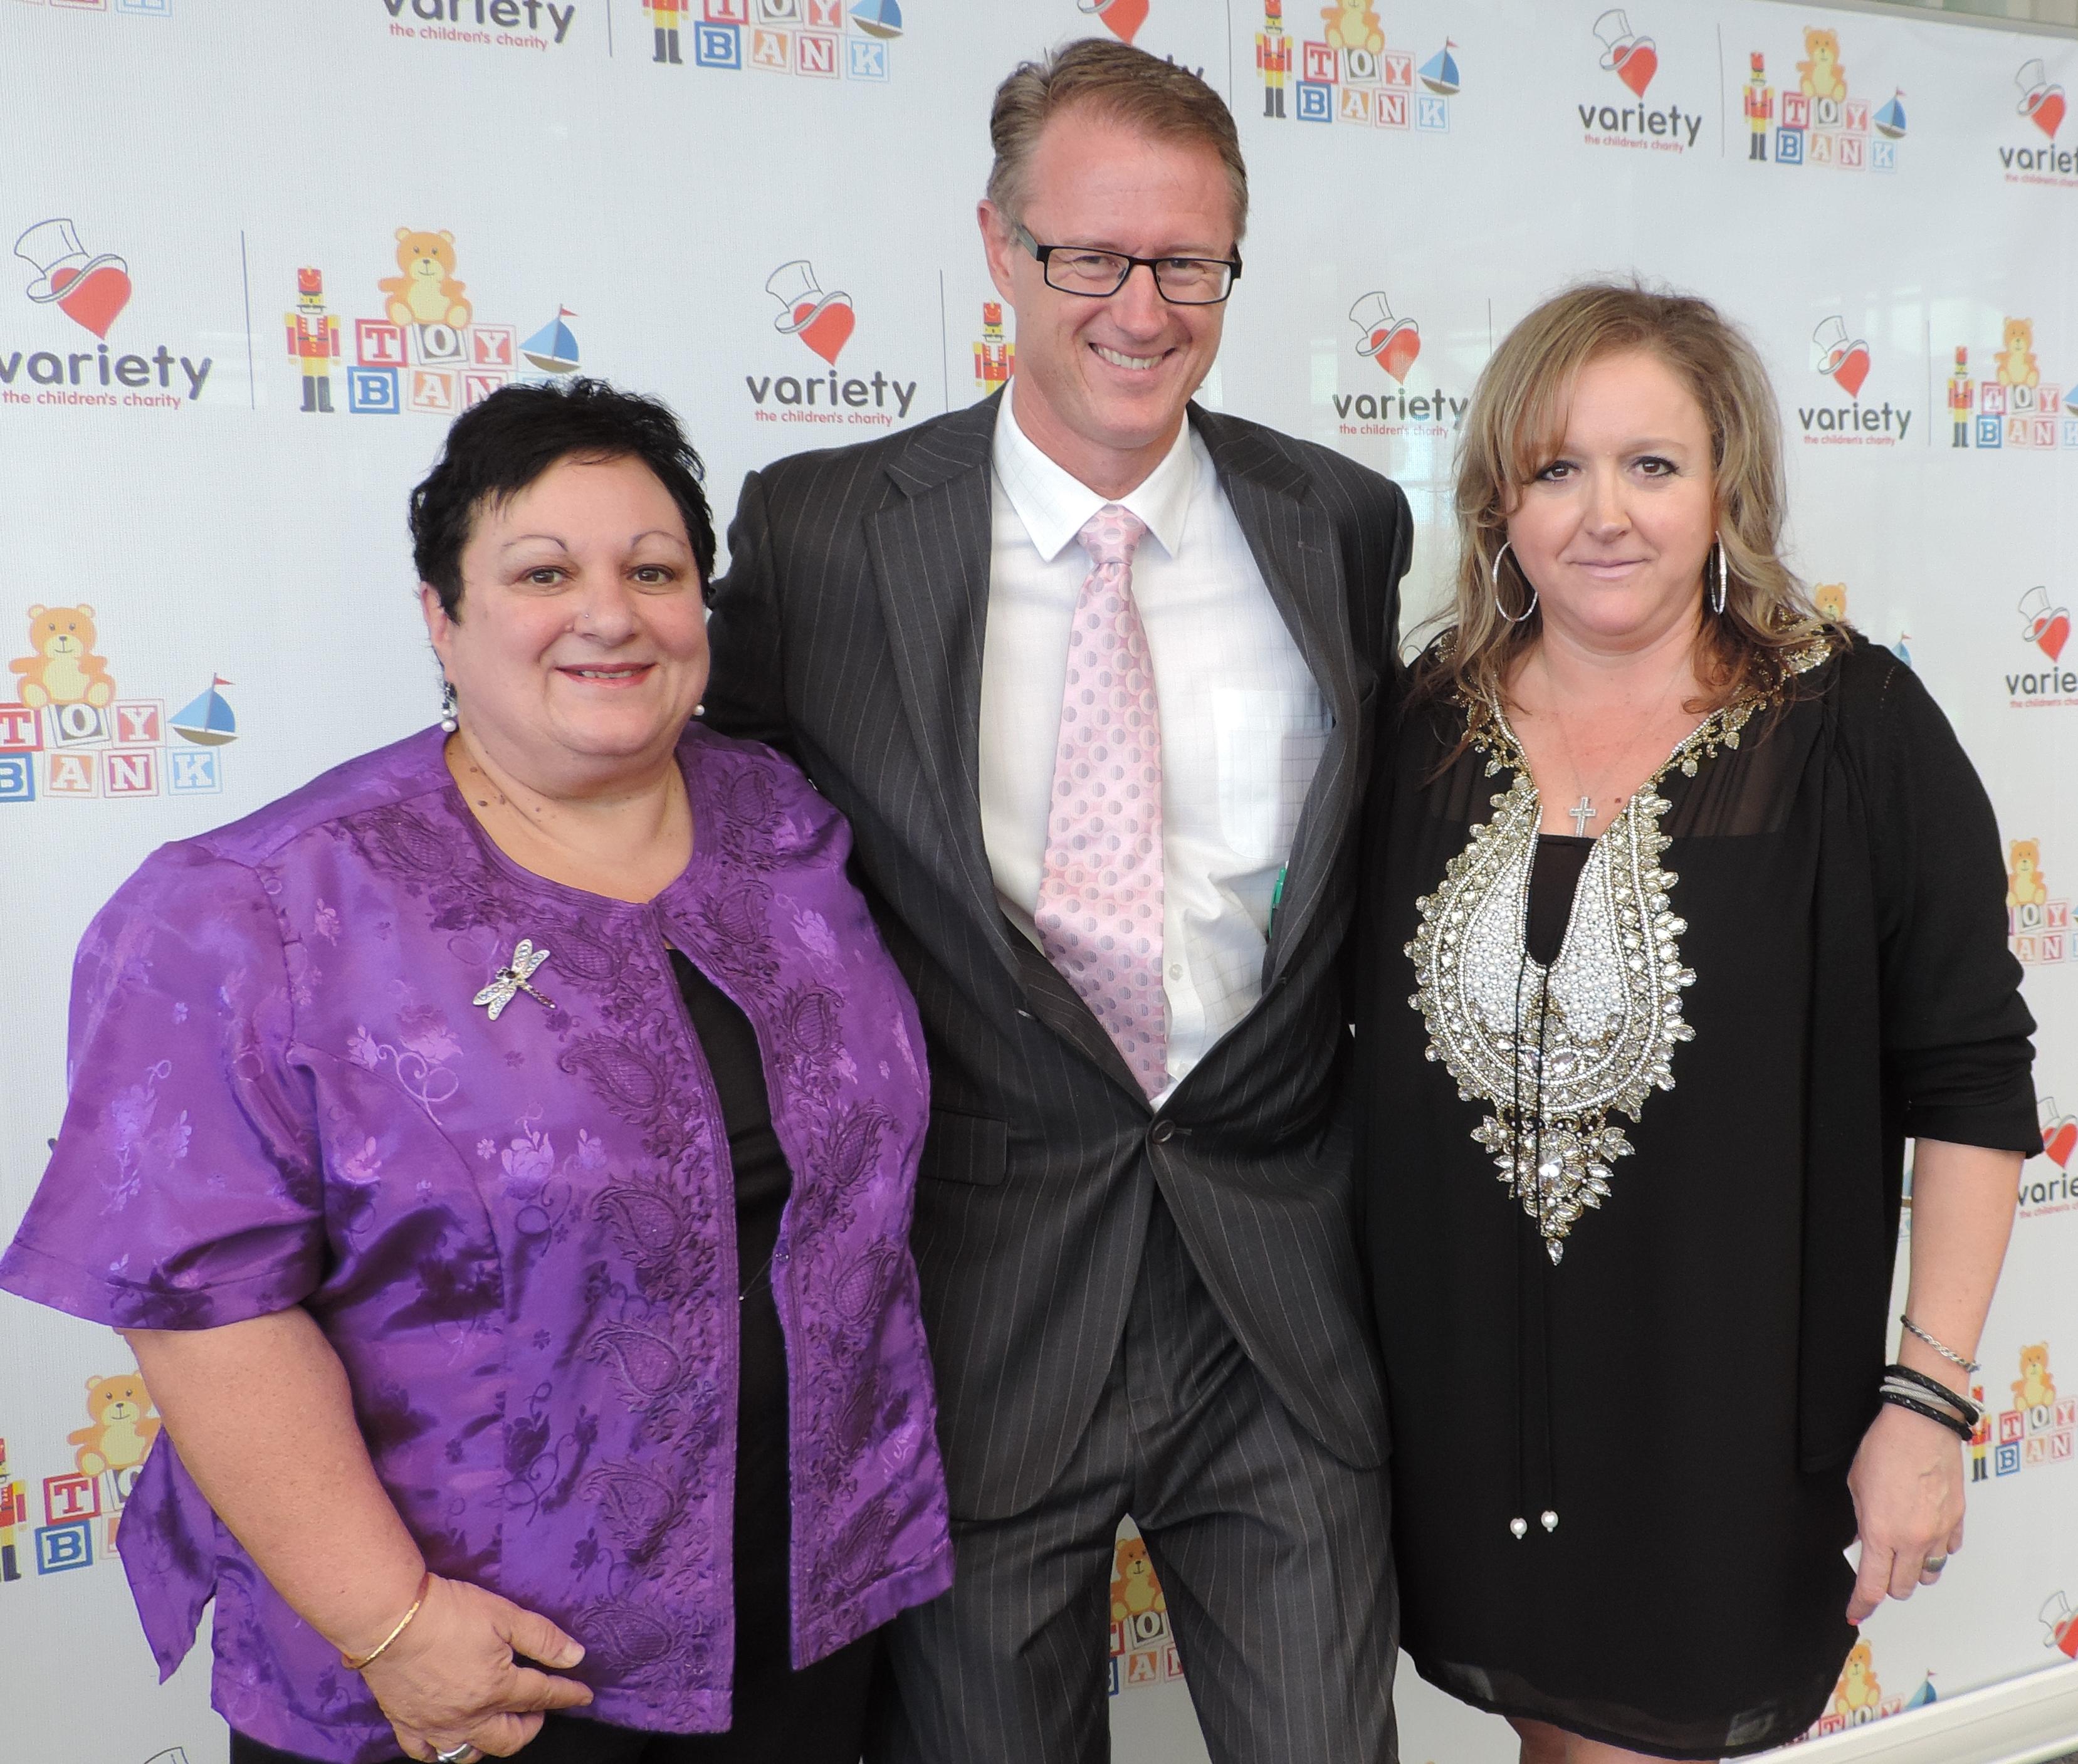 Angela, Michael and Judy